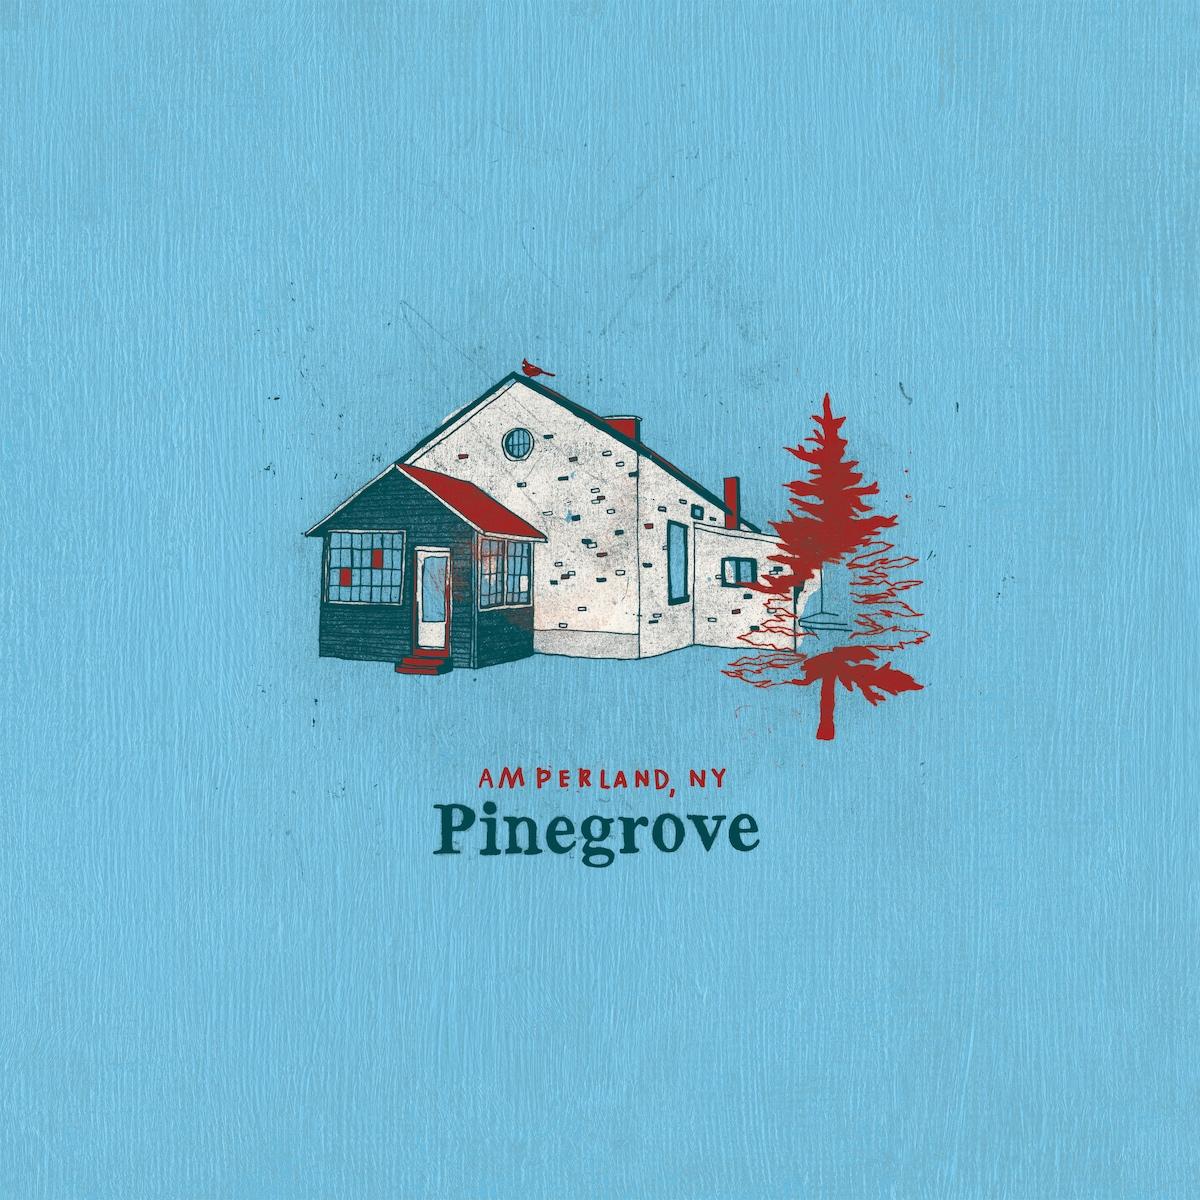 amperland ny soundtrack movie pinegrove artwork